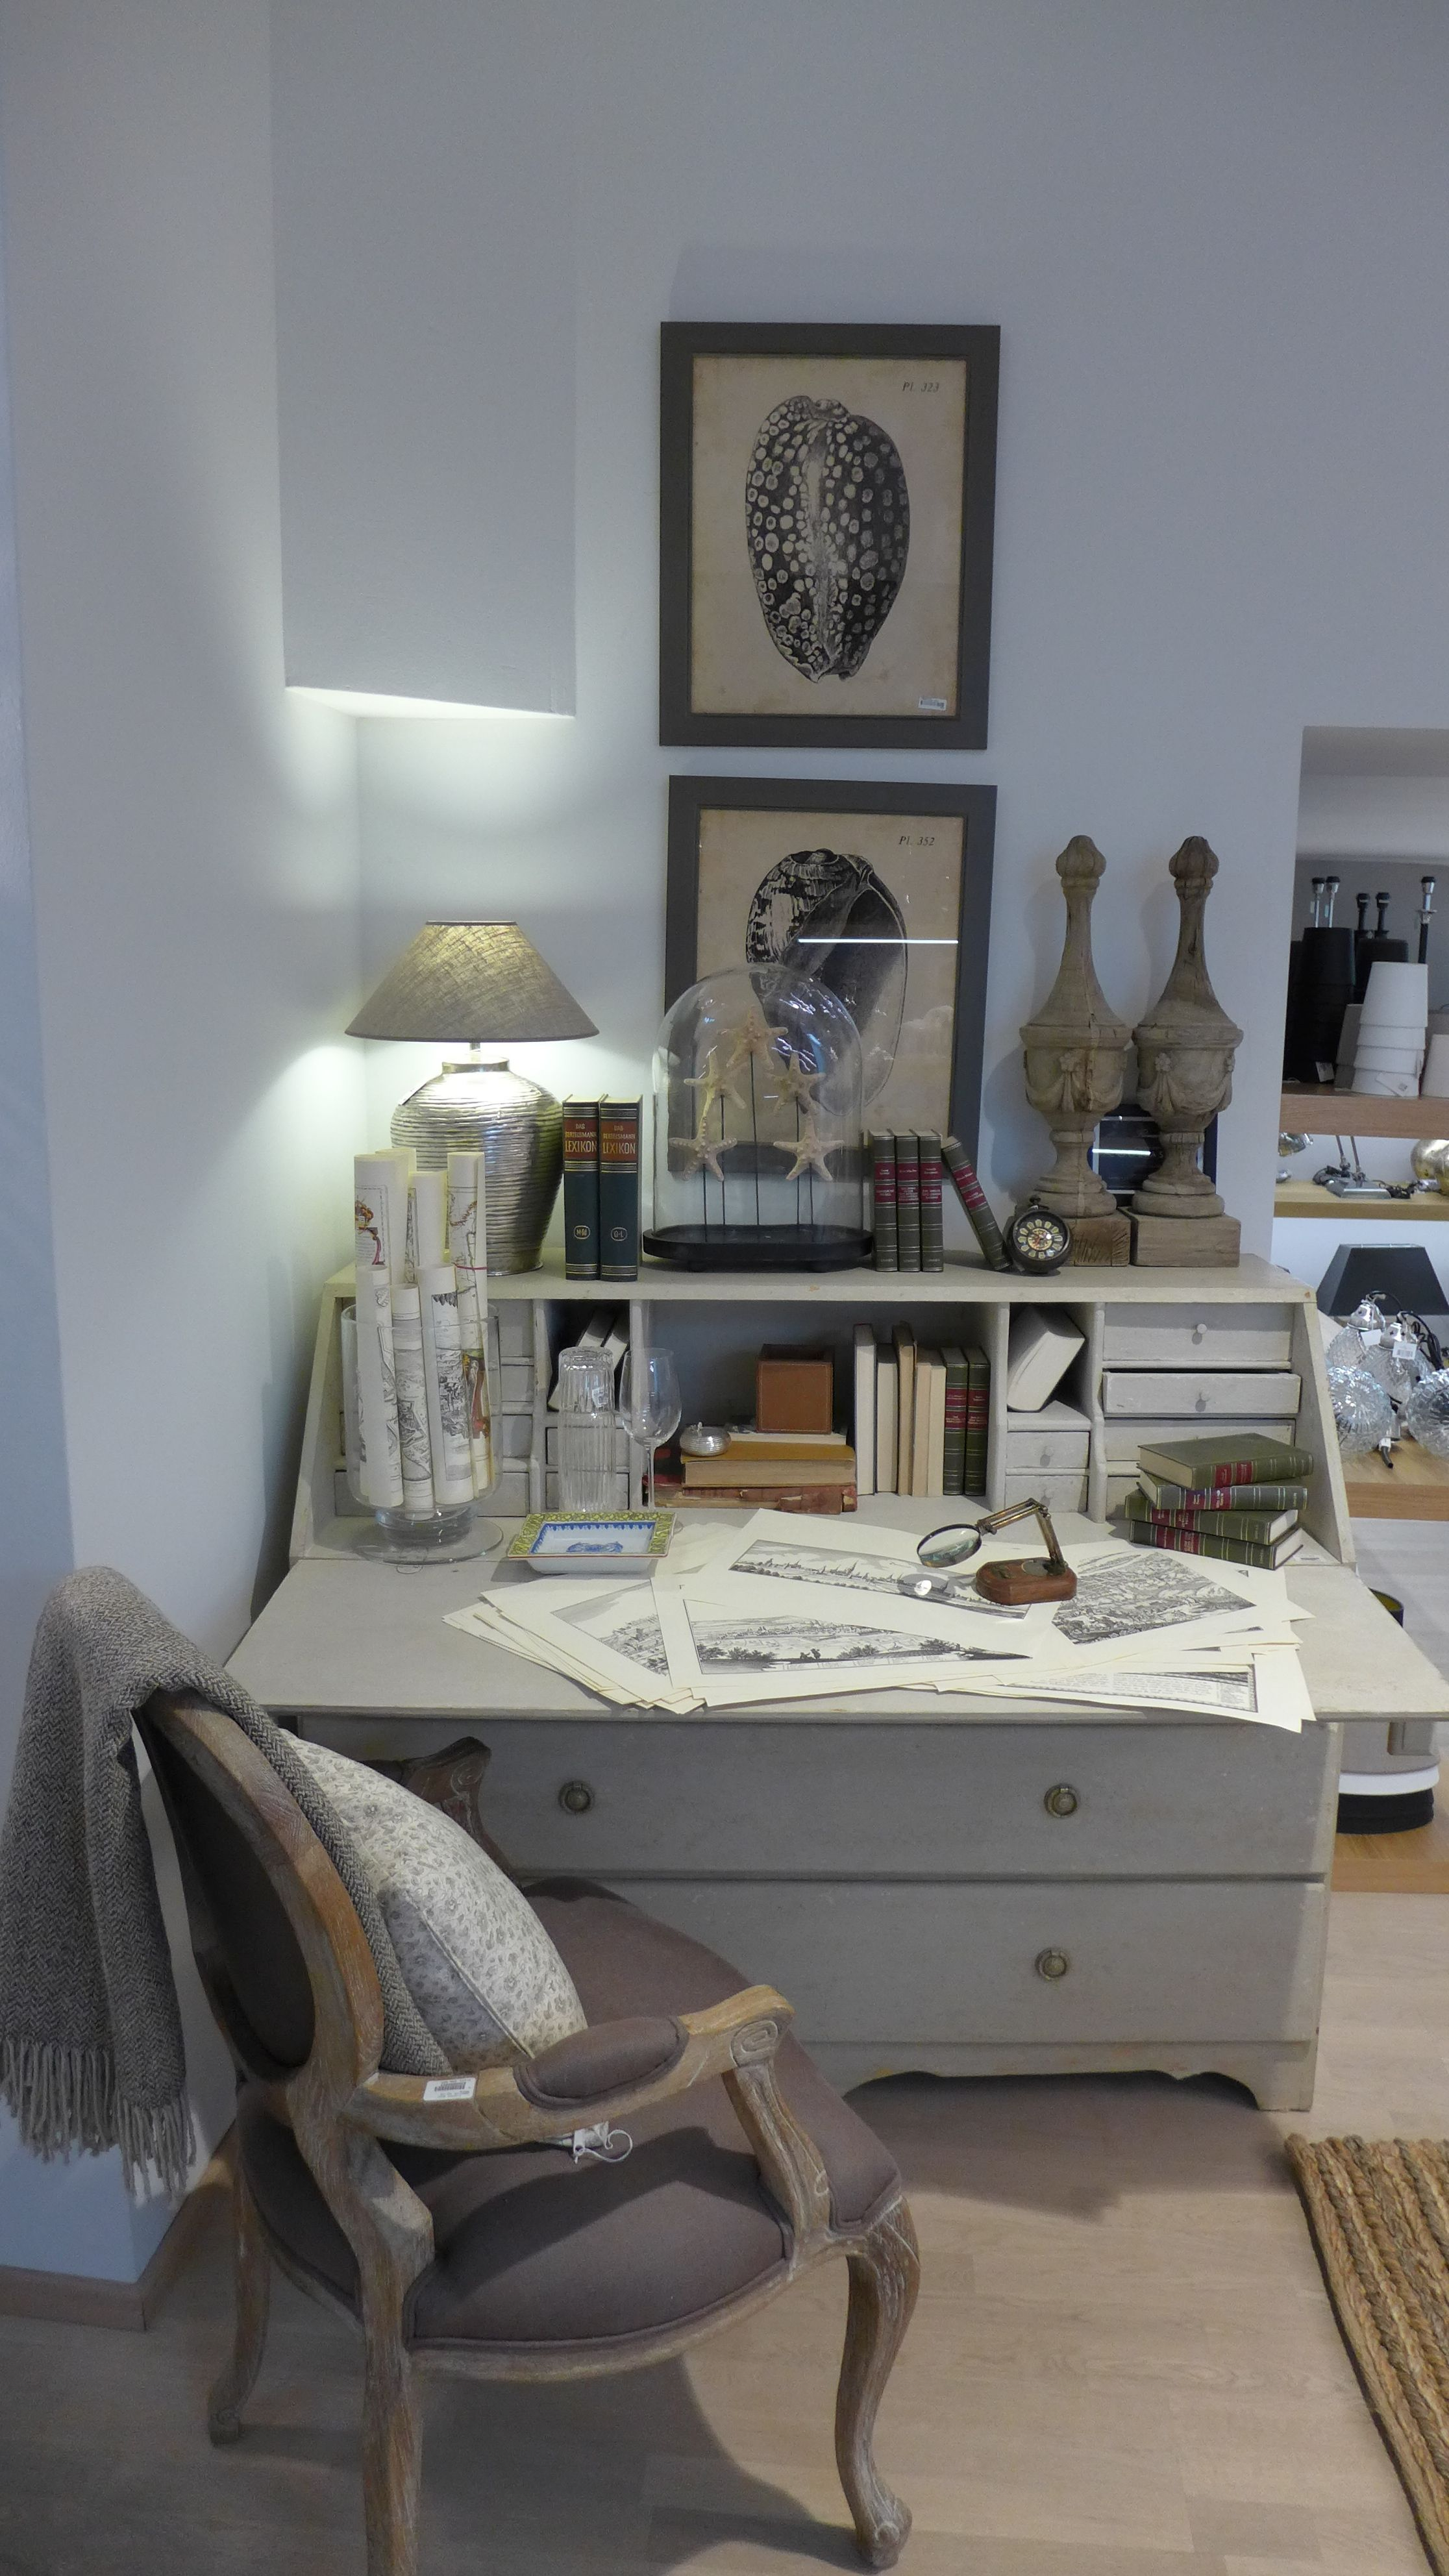 flamantbonn flamant interior design schoenerwohnen living home interiors - Home Styling Blog